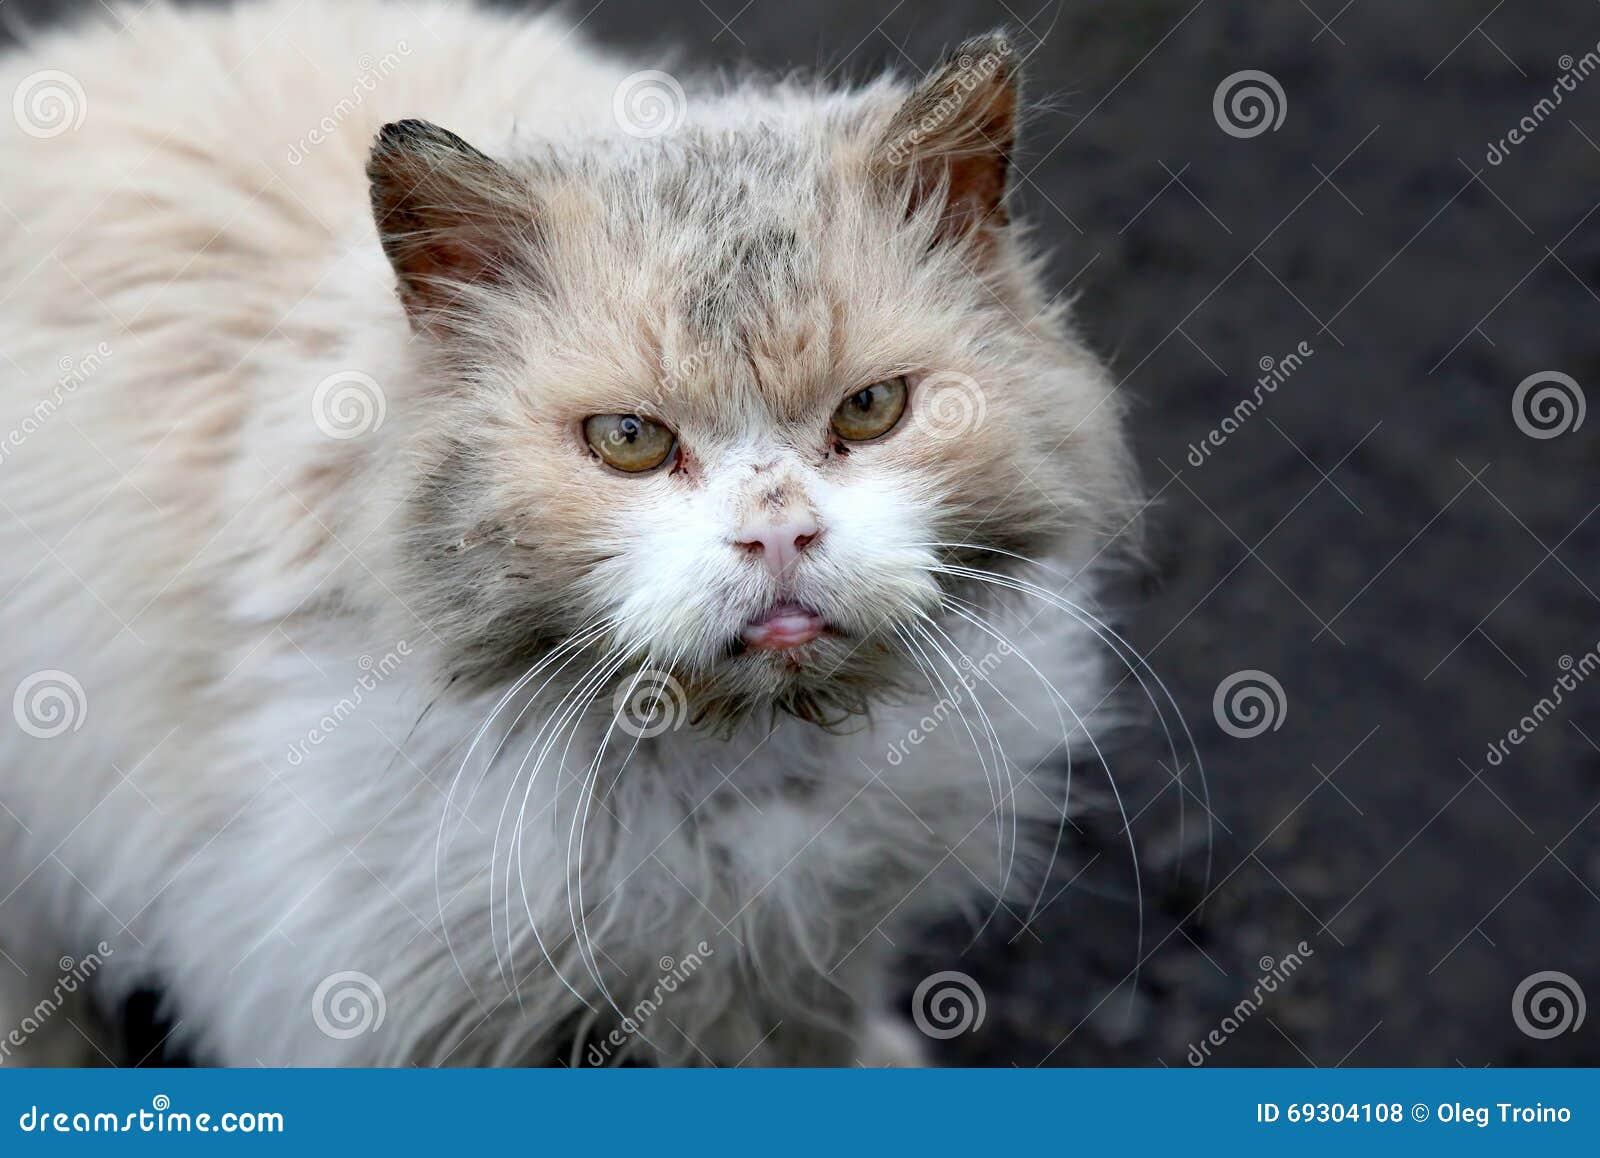 Gato gruñón de la calle sin hogar sucia